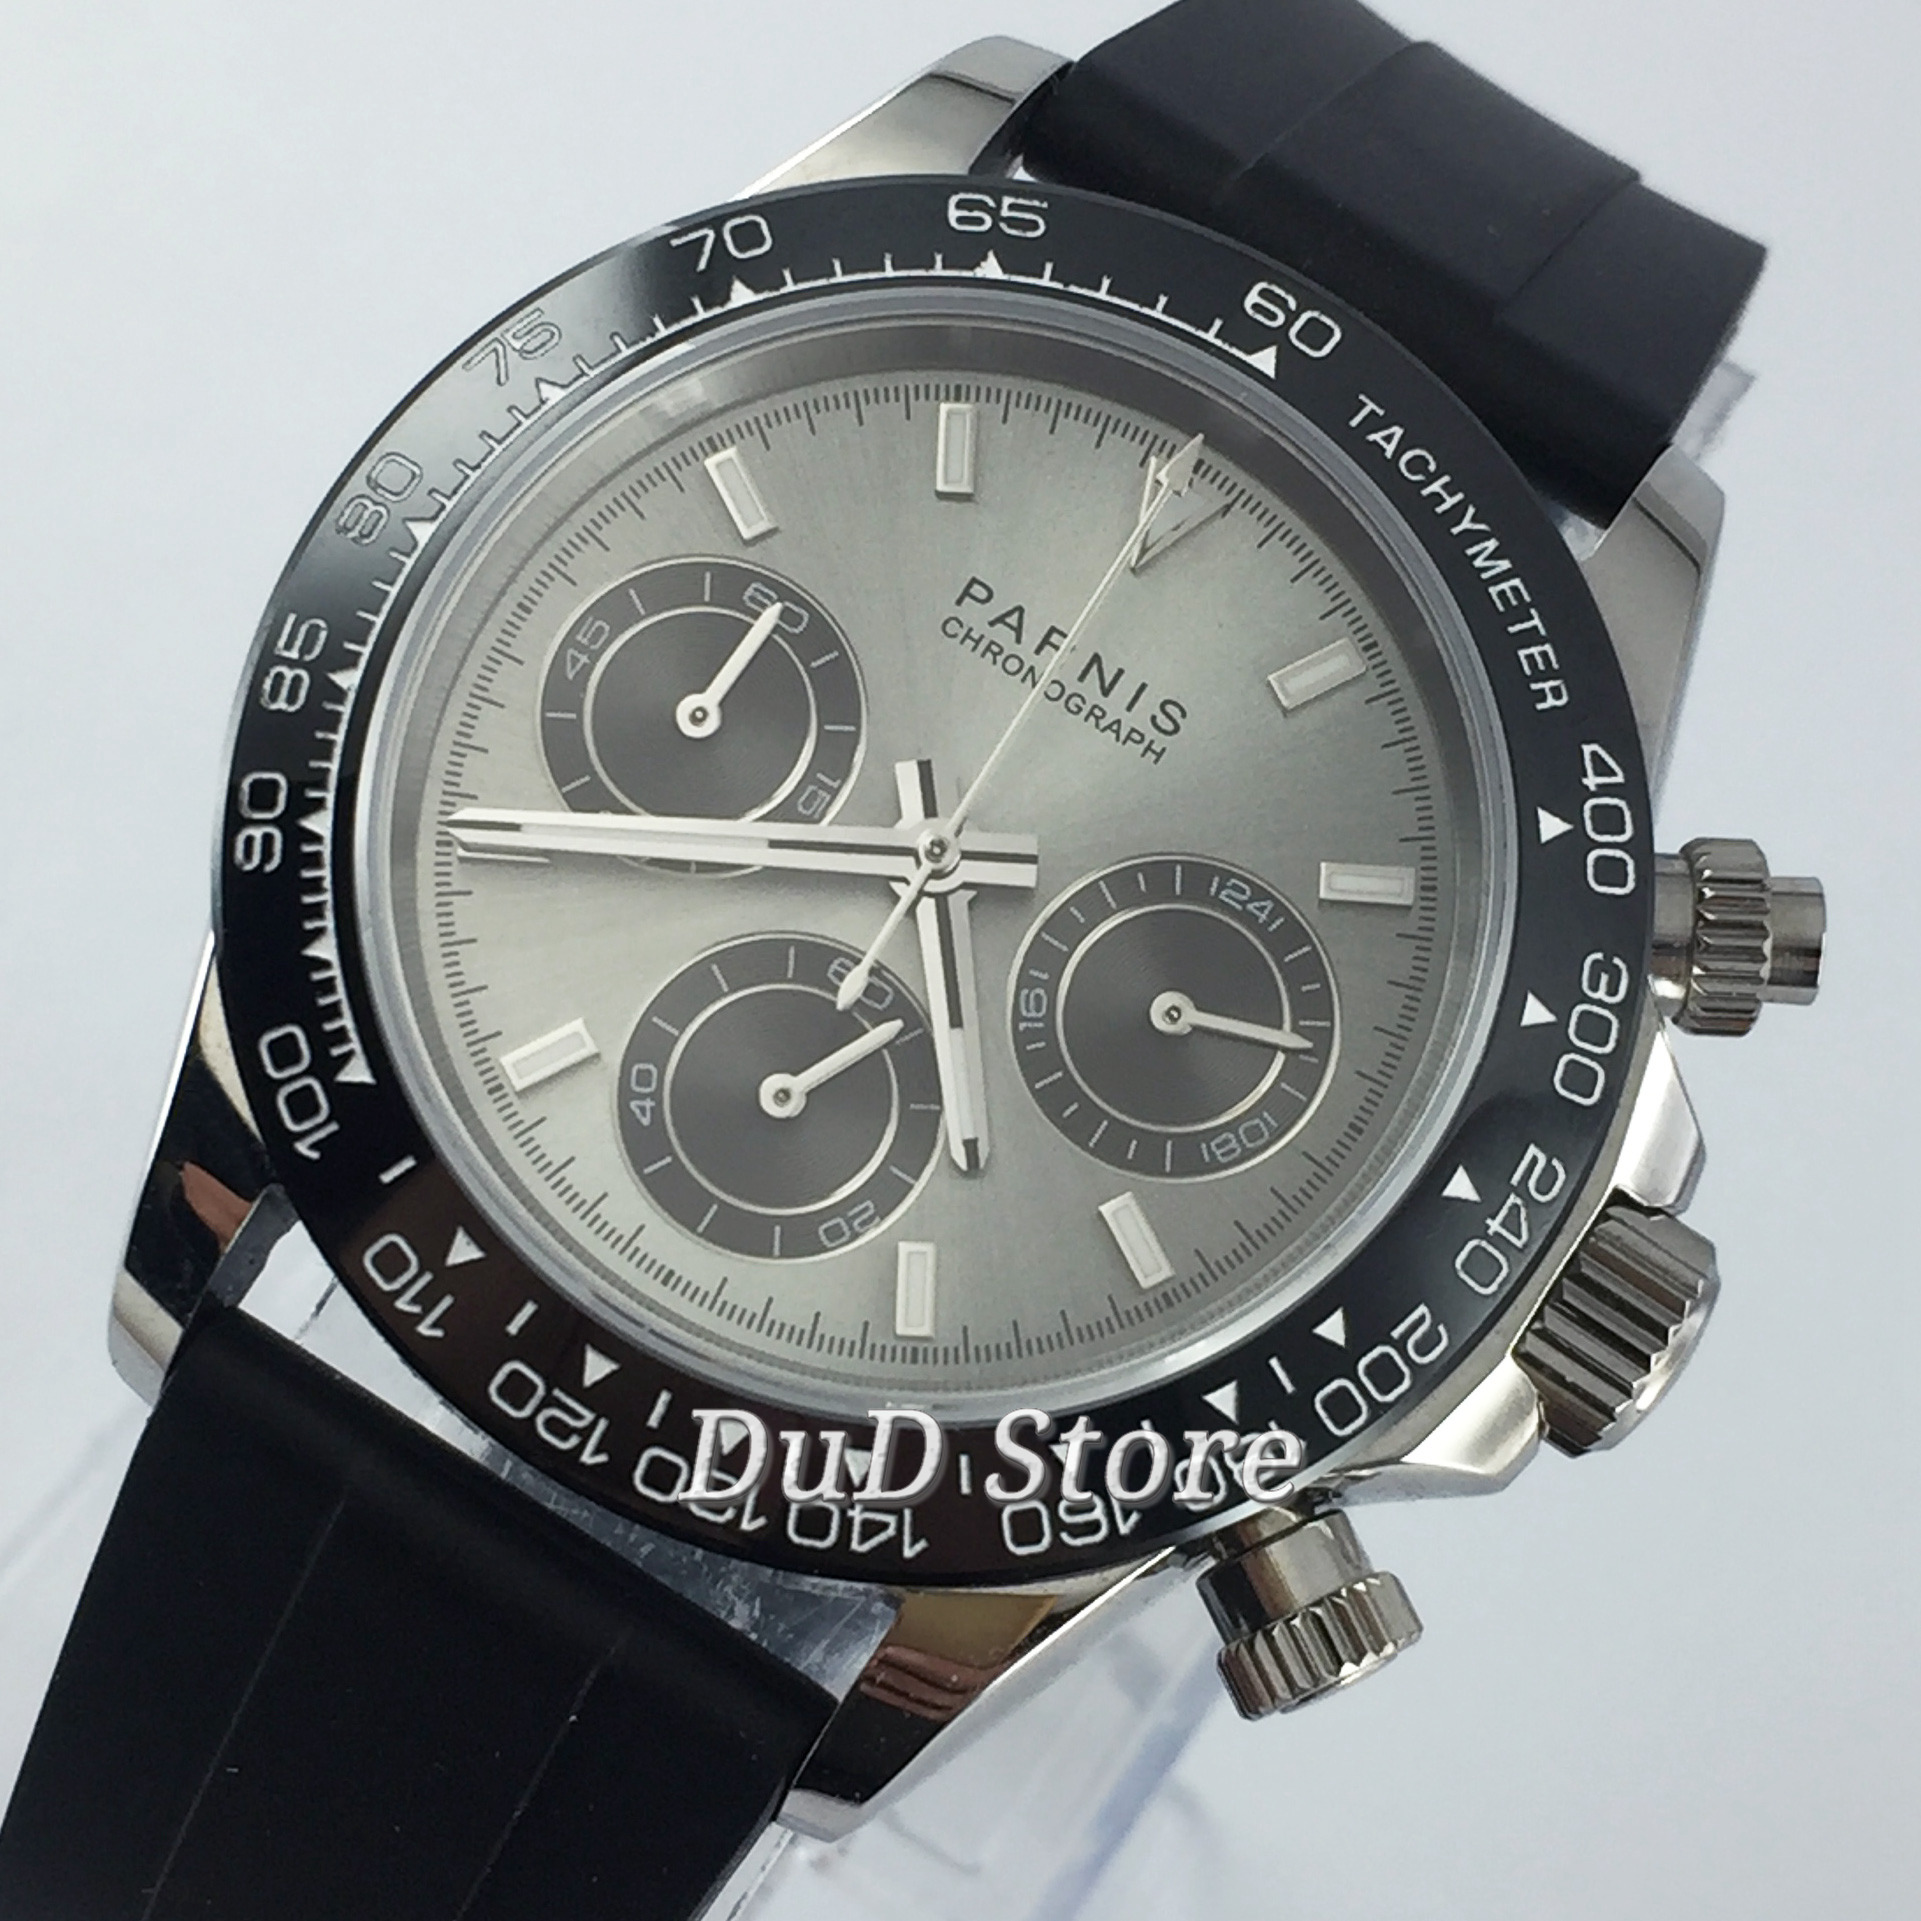 PARNIS 39mm luminous Quartz men's watch Rubber strap Full Chronograph gray dial sapphire glass black bezel stop watch men watch